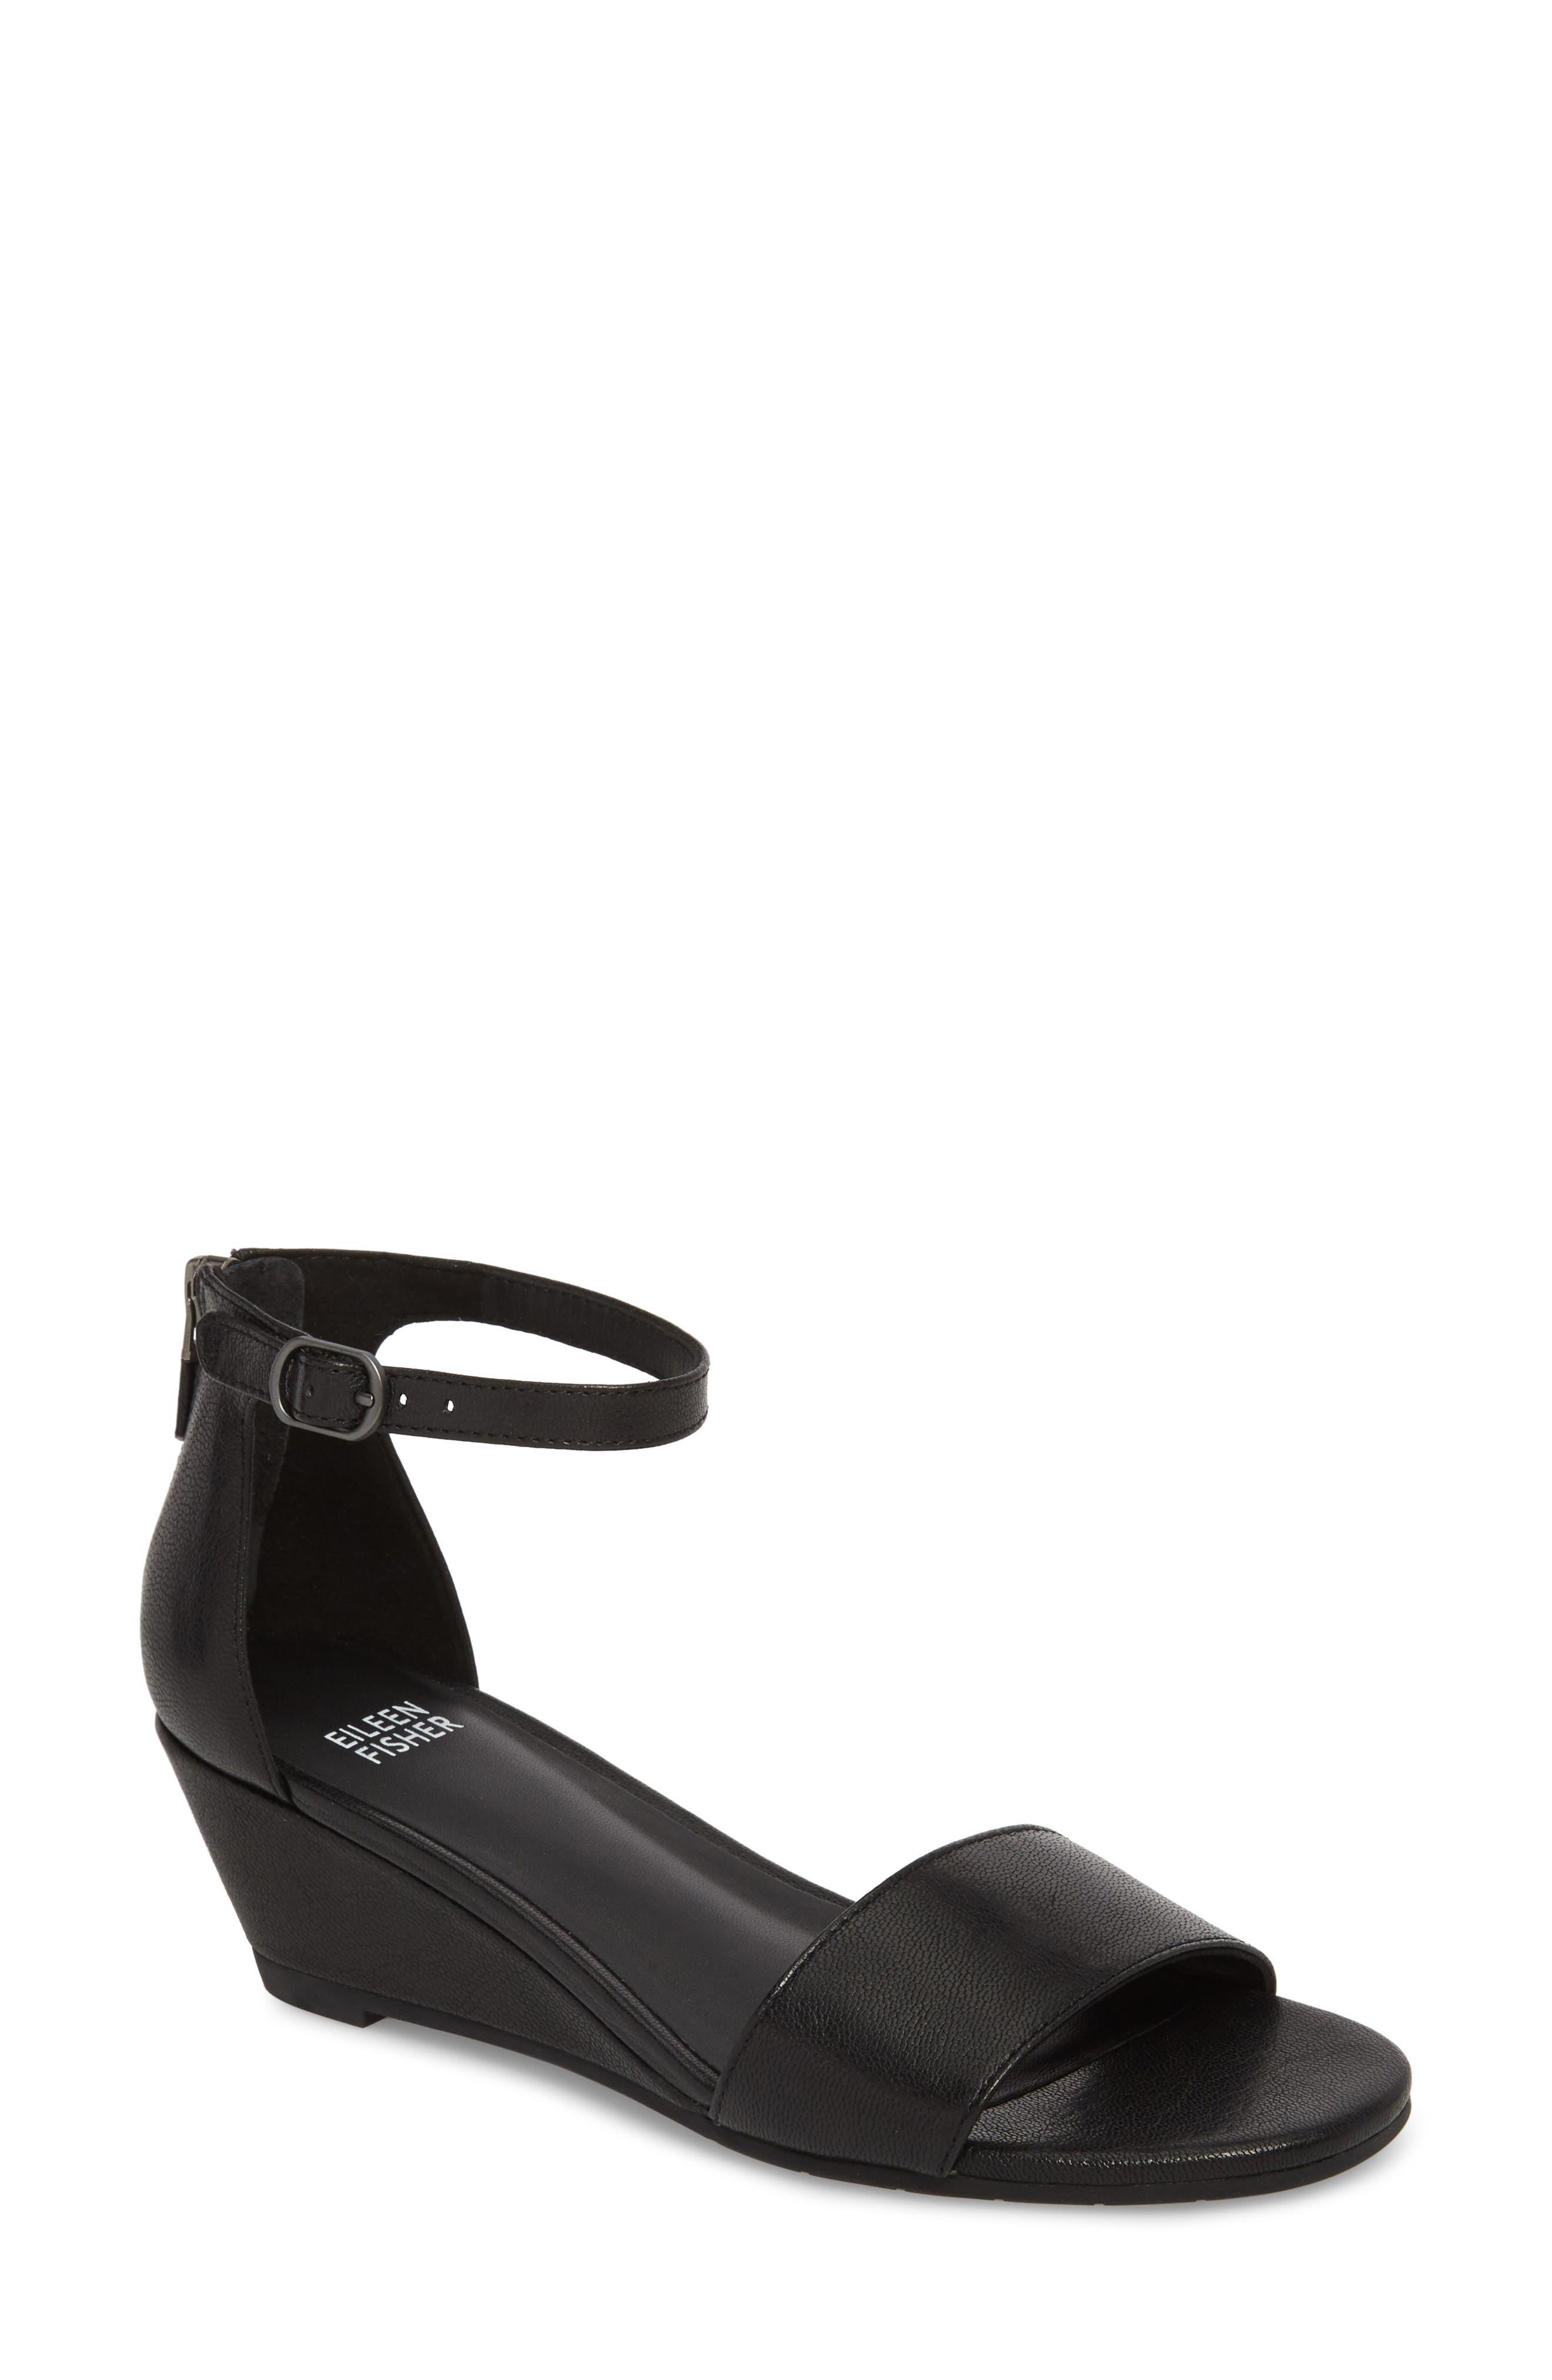 Eileen Fisher Women's Mara Ankle Strap Wedge Sandal aXoj8